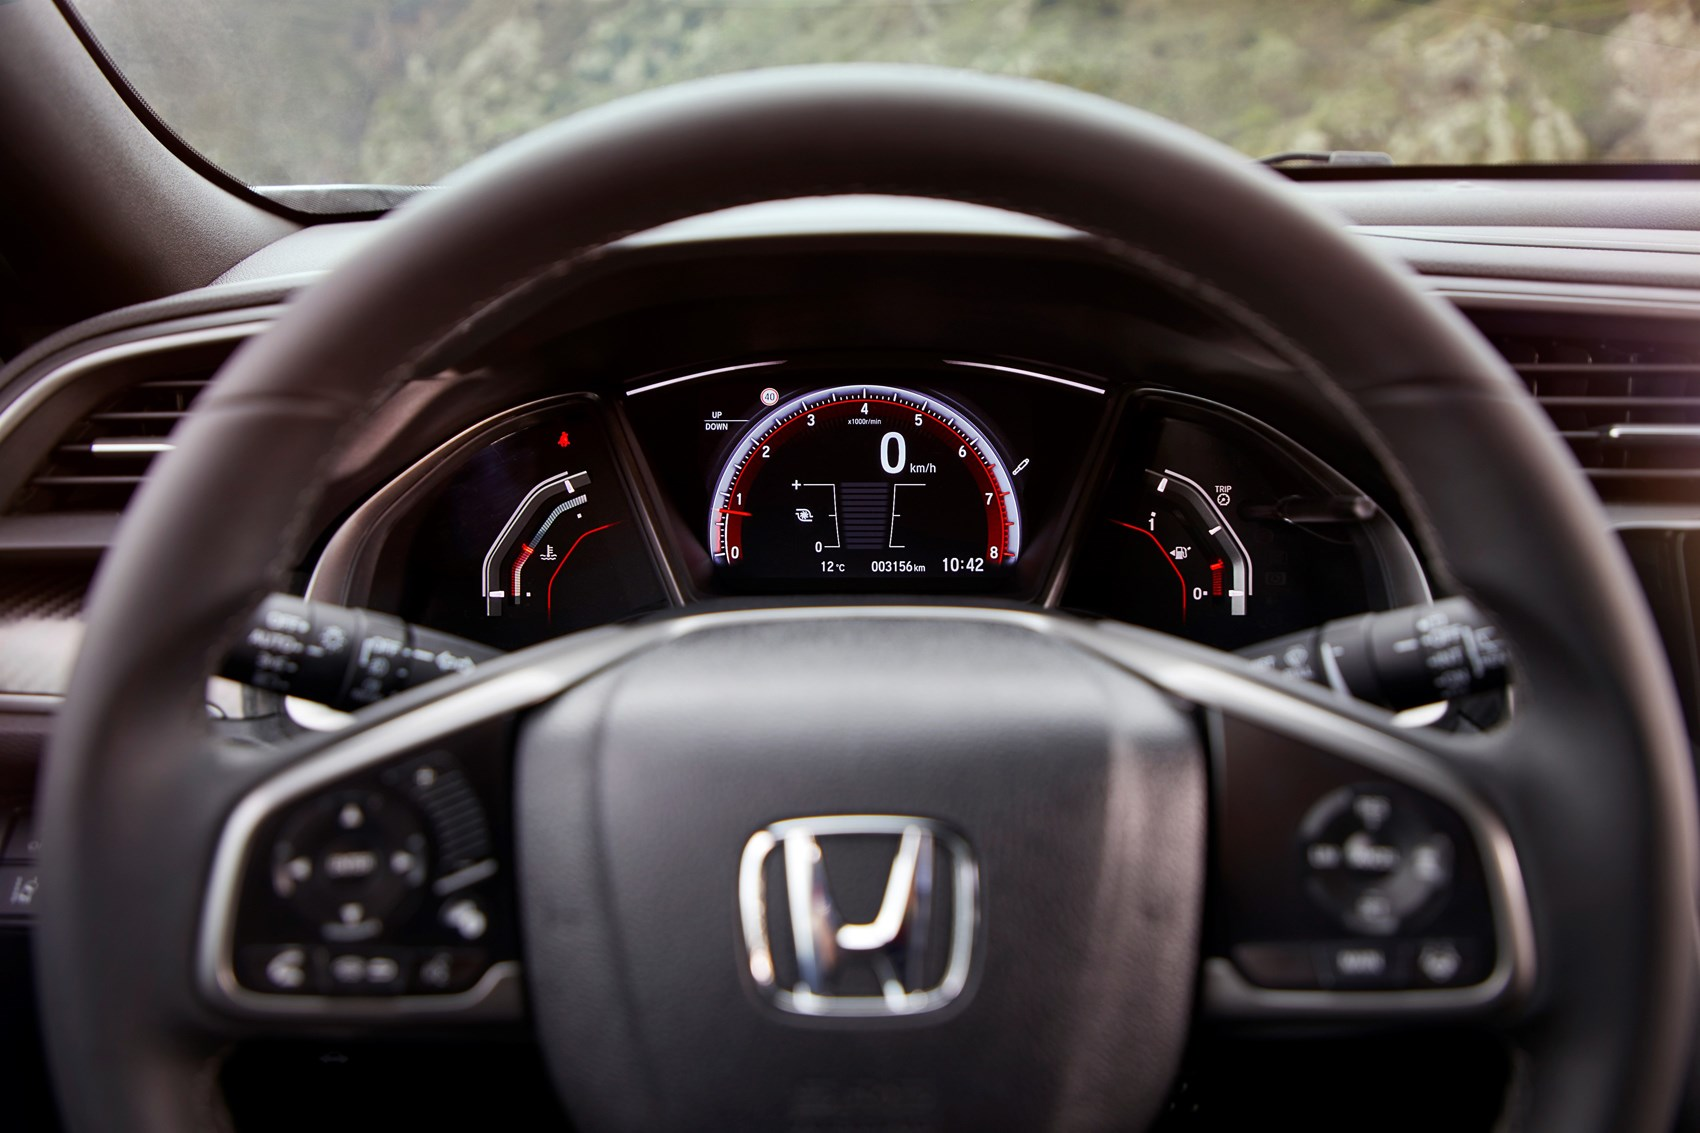 Honda Civic Hatchback Driving & Performance